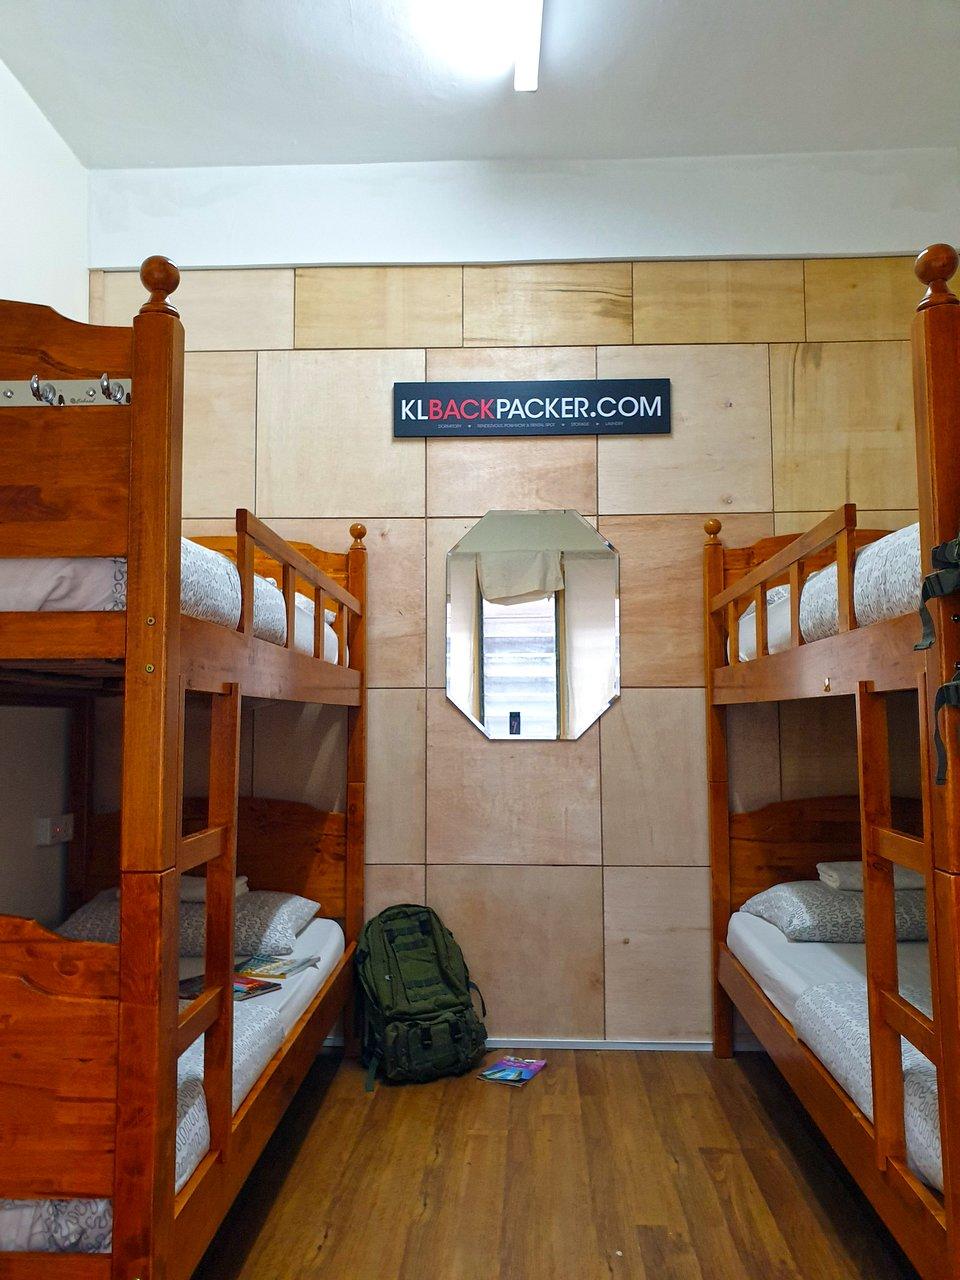 Kl Backpacker Hostel Prices Reviews Kuala Lumpur Malaysia Tripadvisor